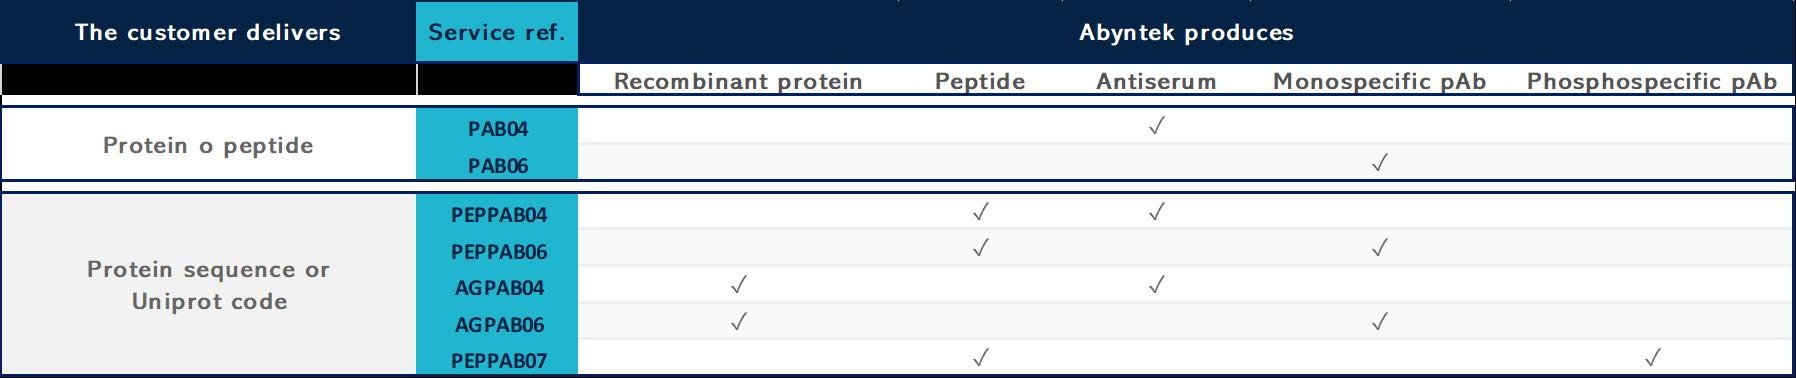 Custom polyclonal antibody production services